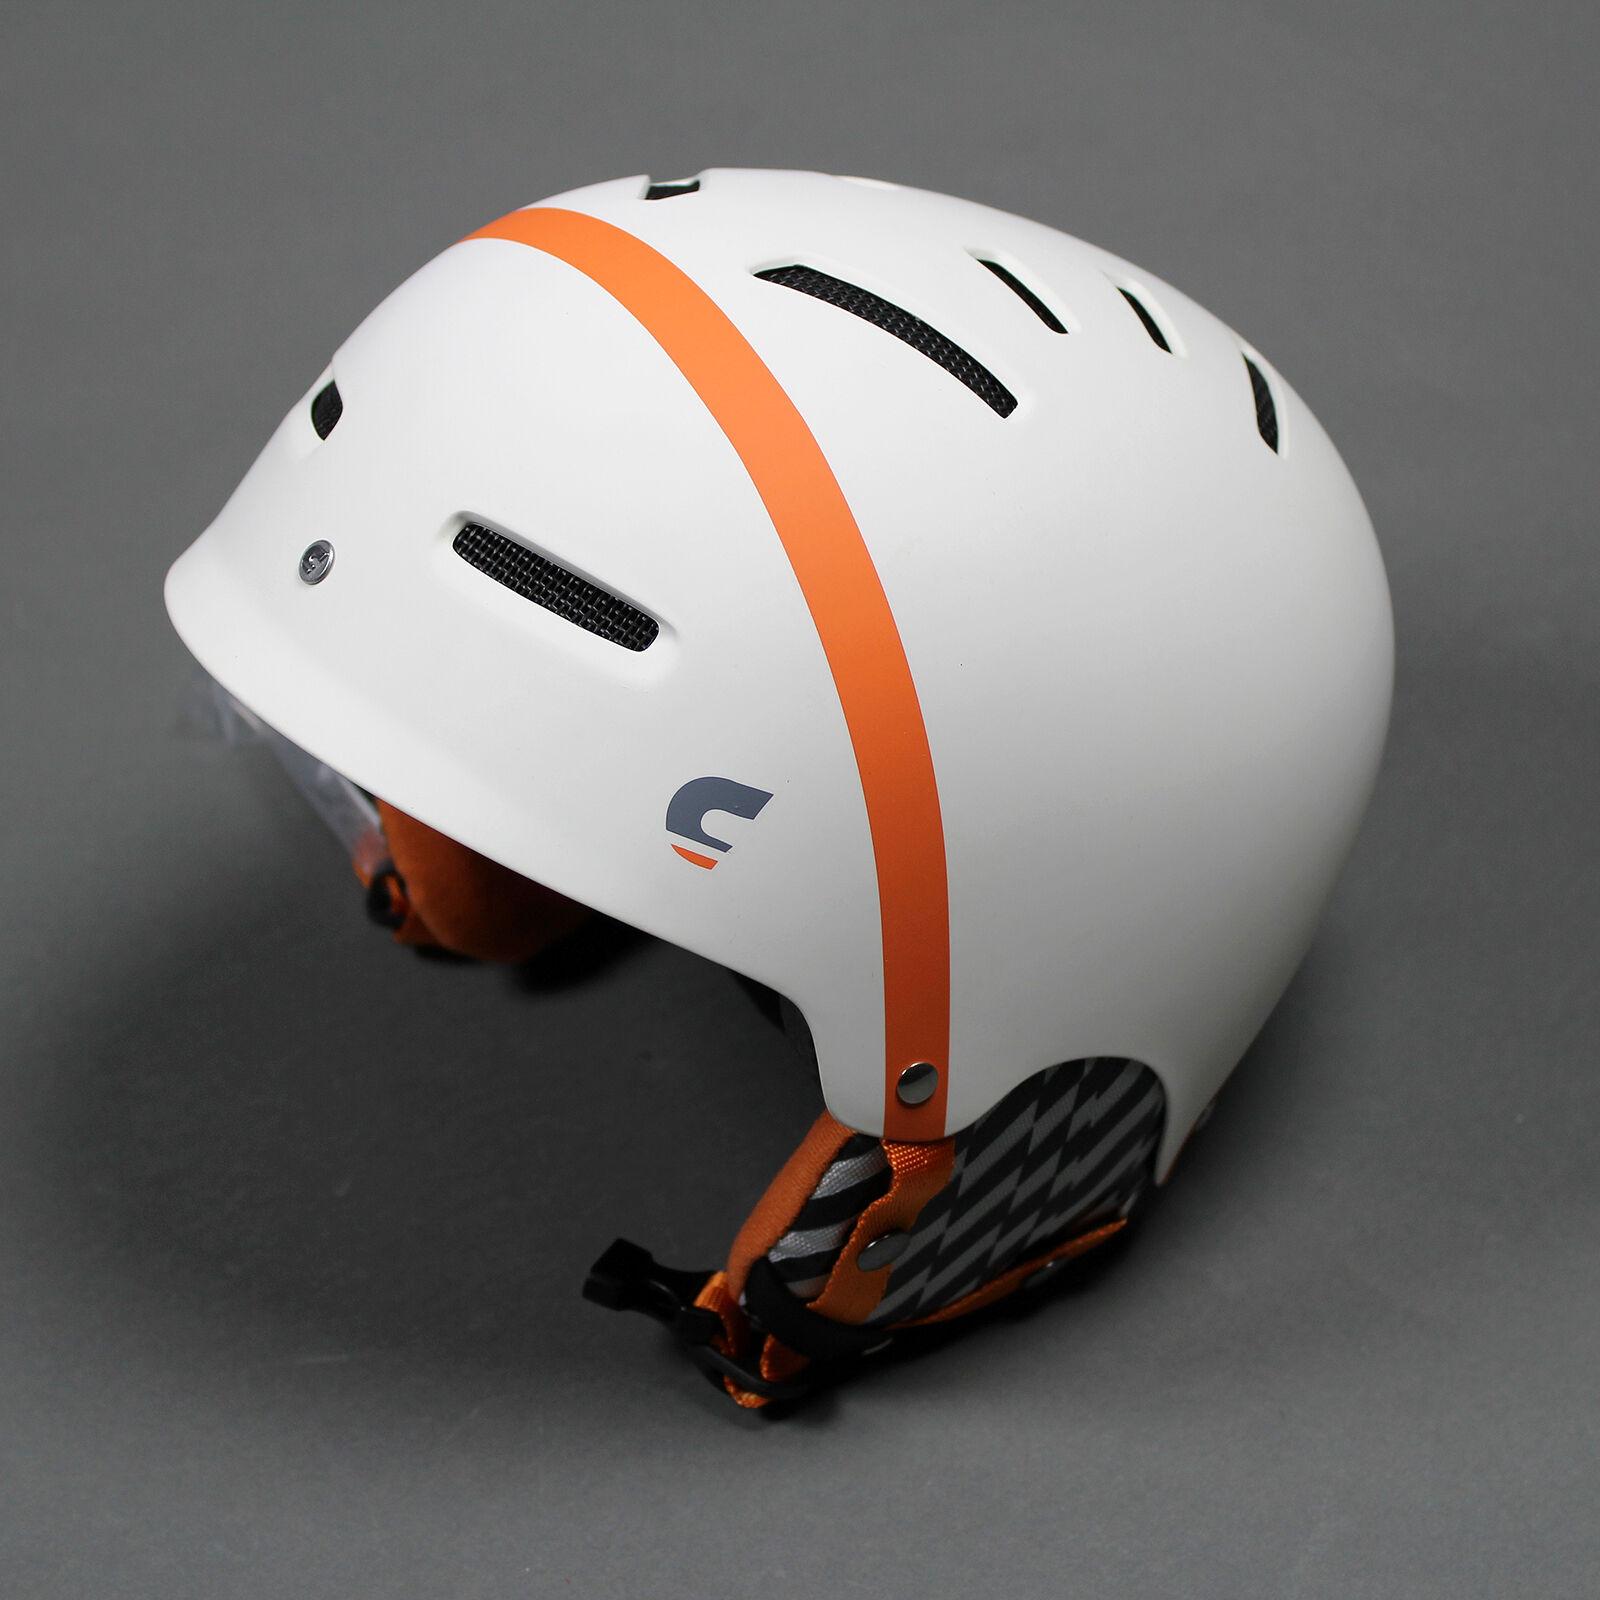 Carrera X-01 Skiing Snowboarding Helmet White Matte (New) Lists For   99.99